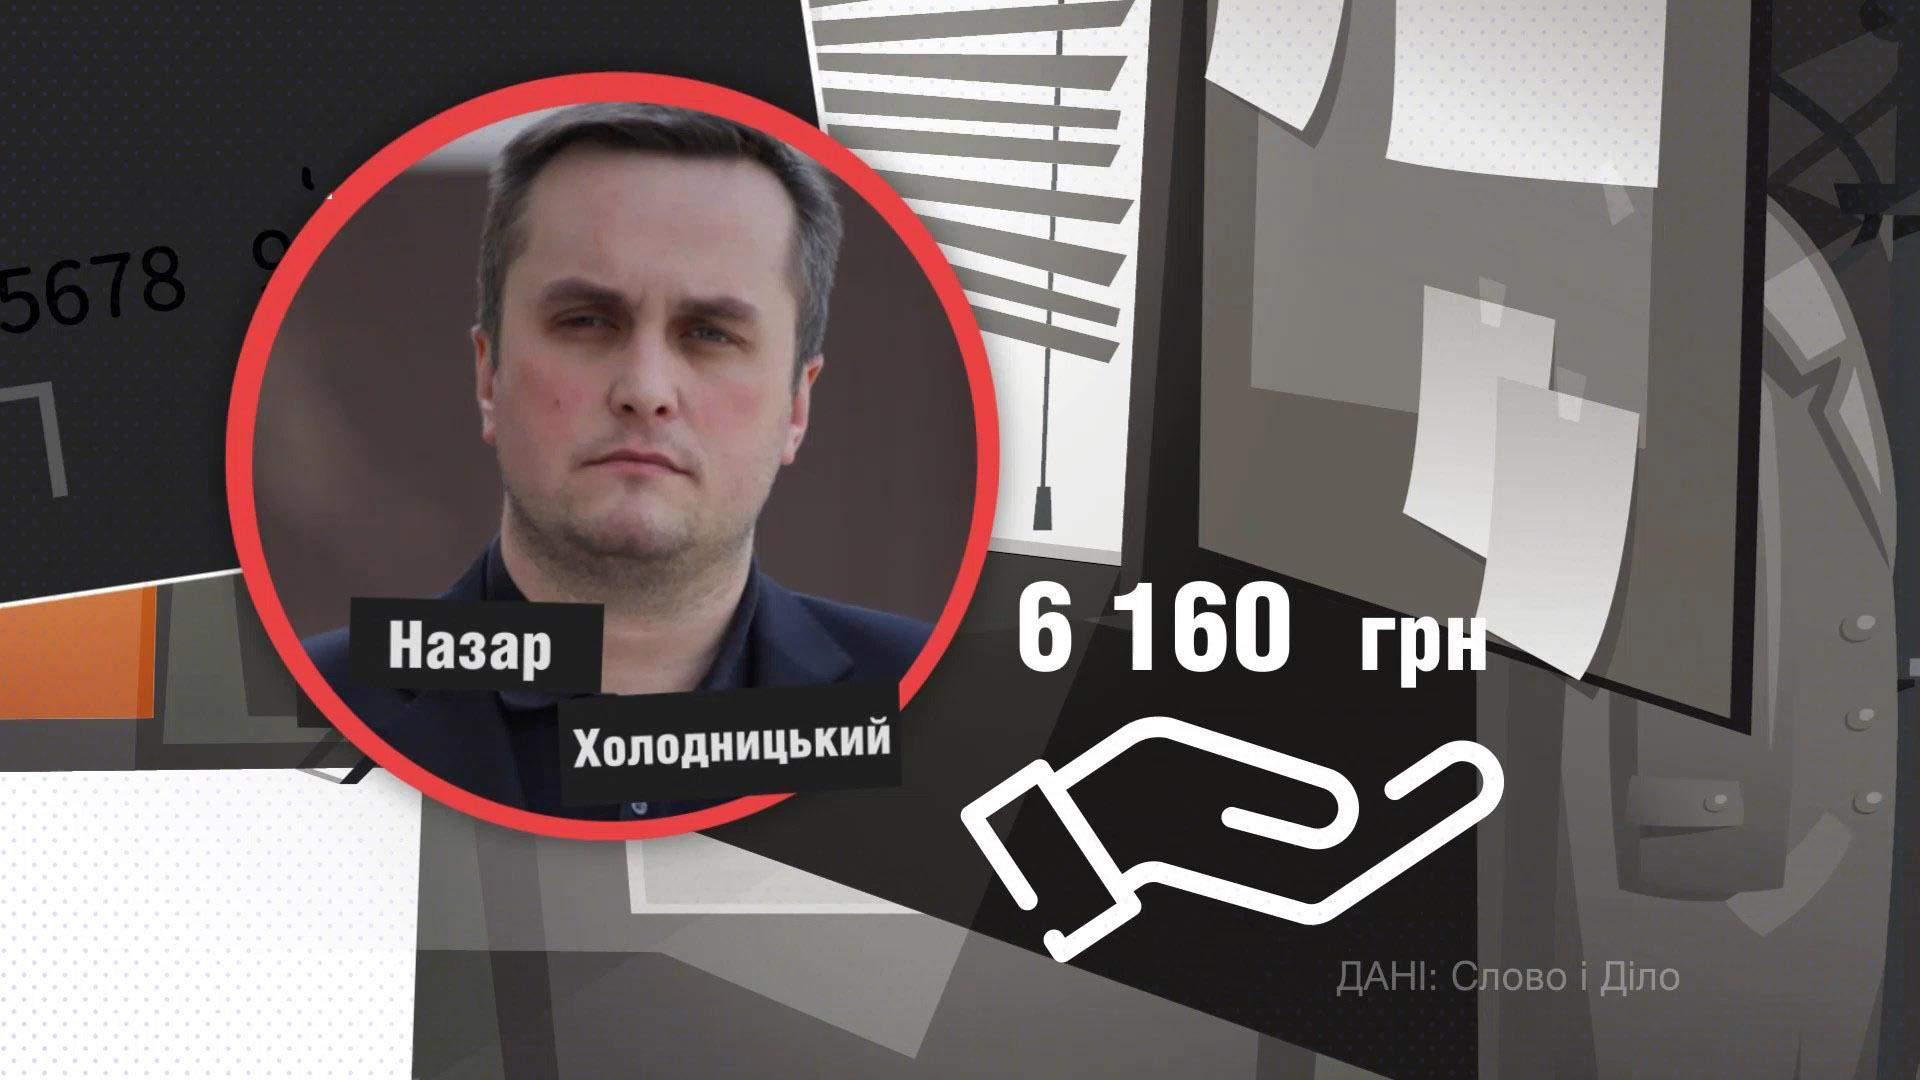 зарплата САП Назар Хололницький